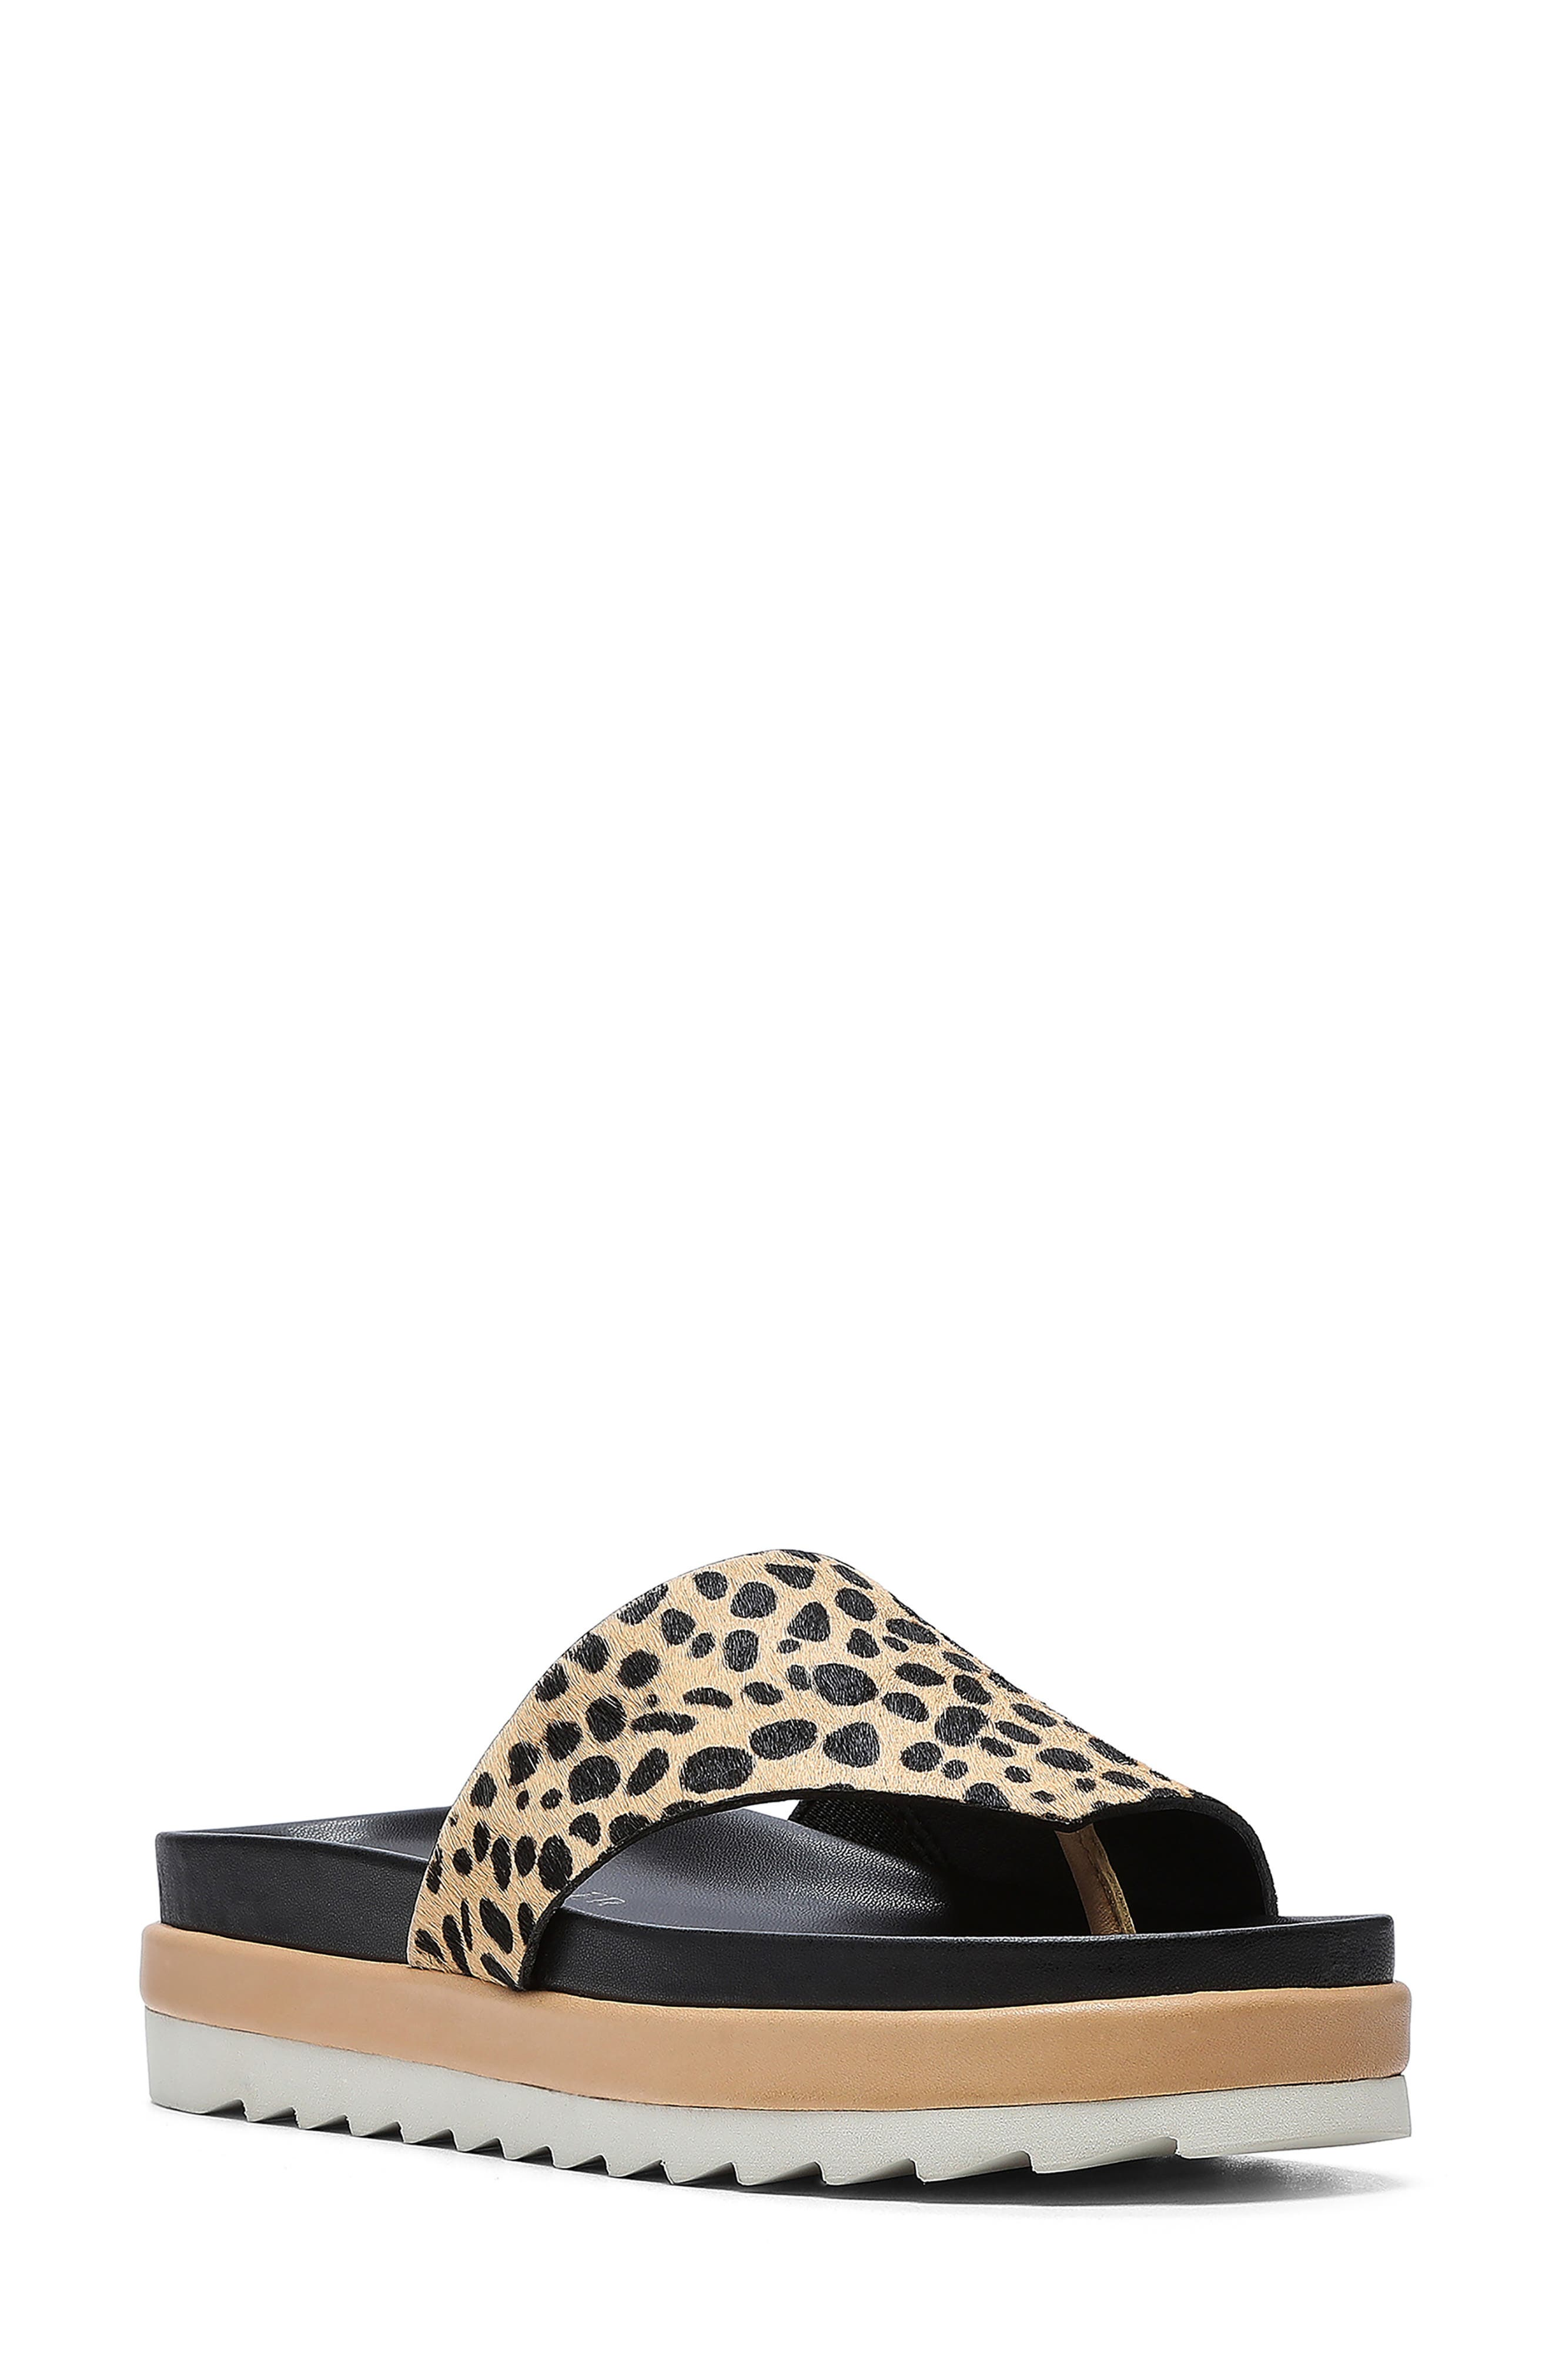 Lylaa Genuine Calf Hair Platform Thong Slide Sandal